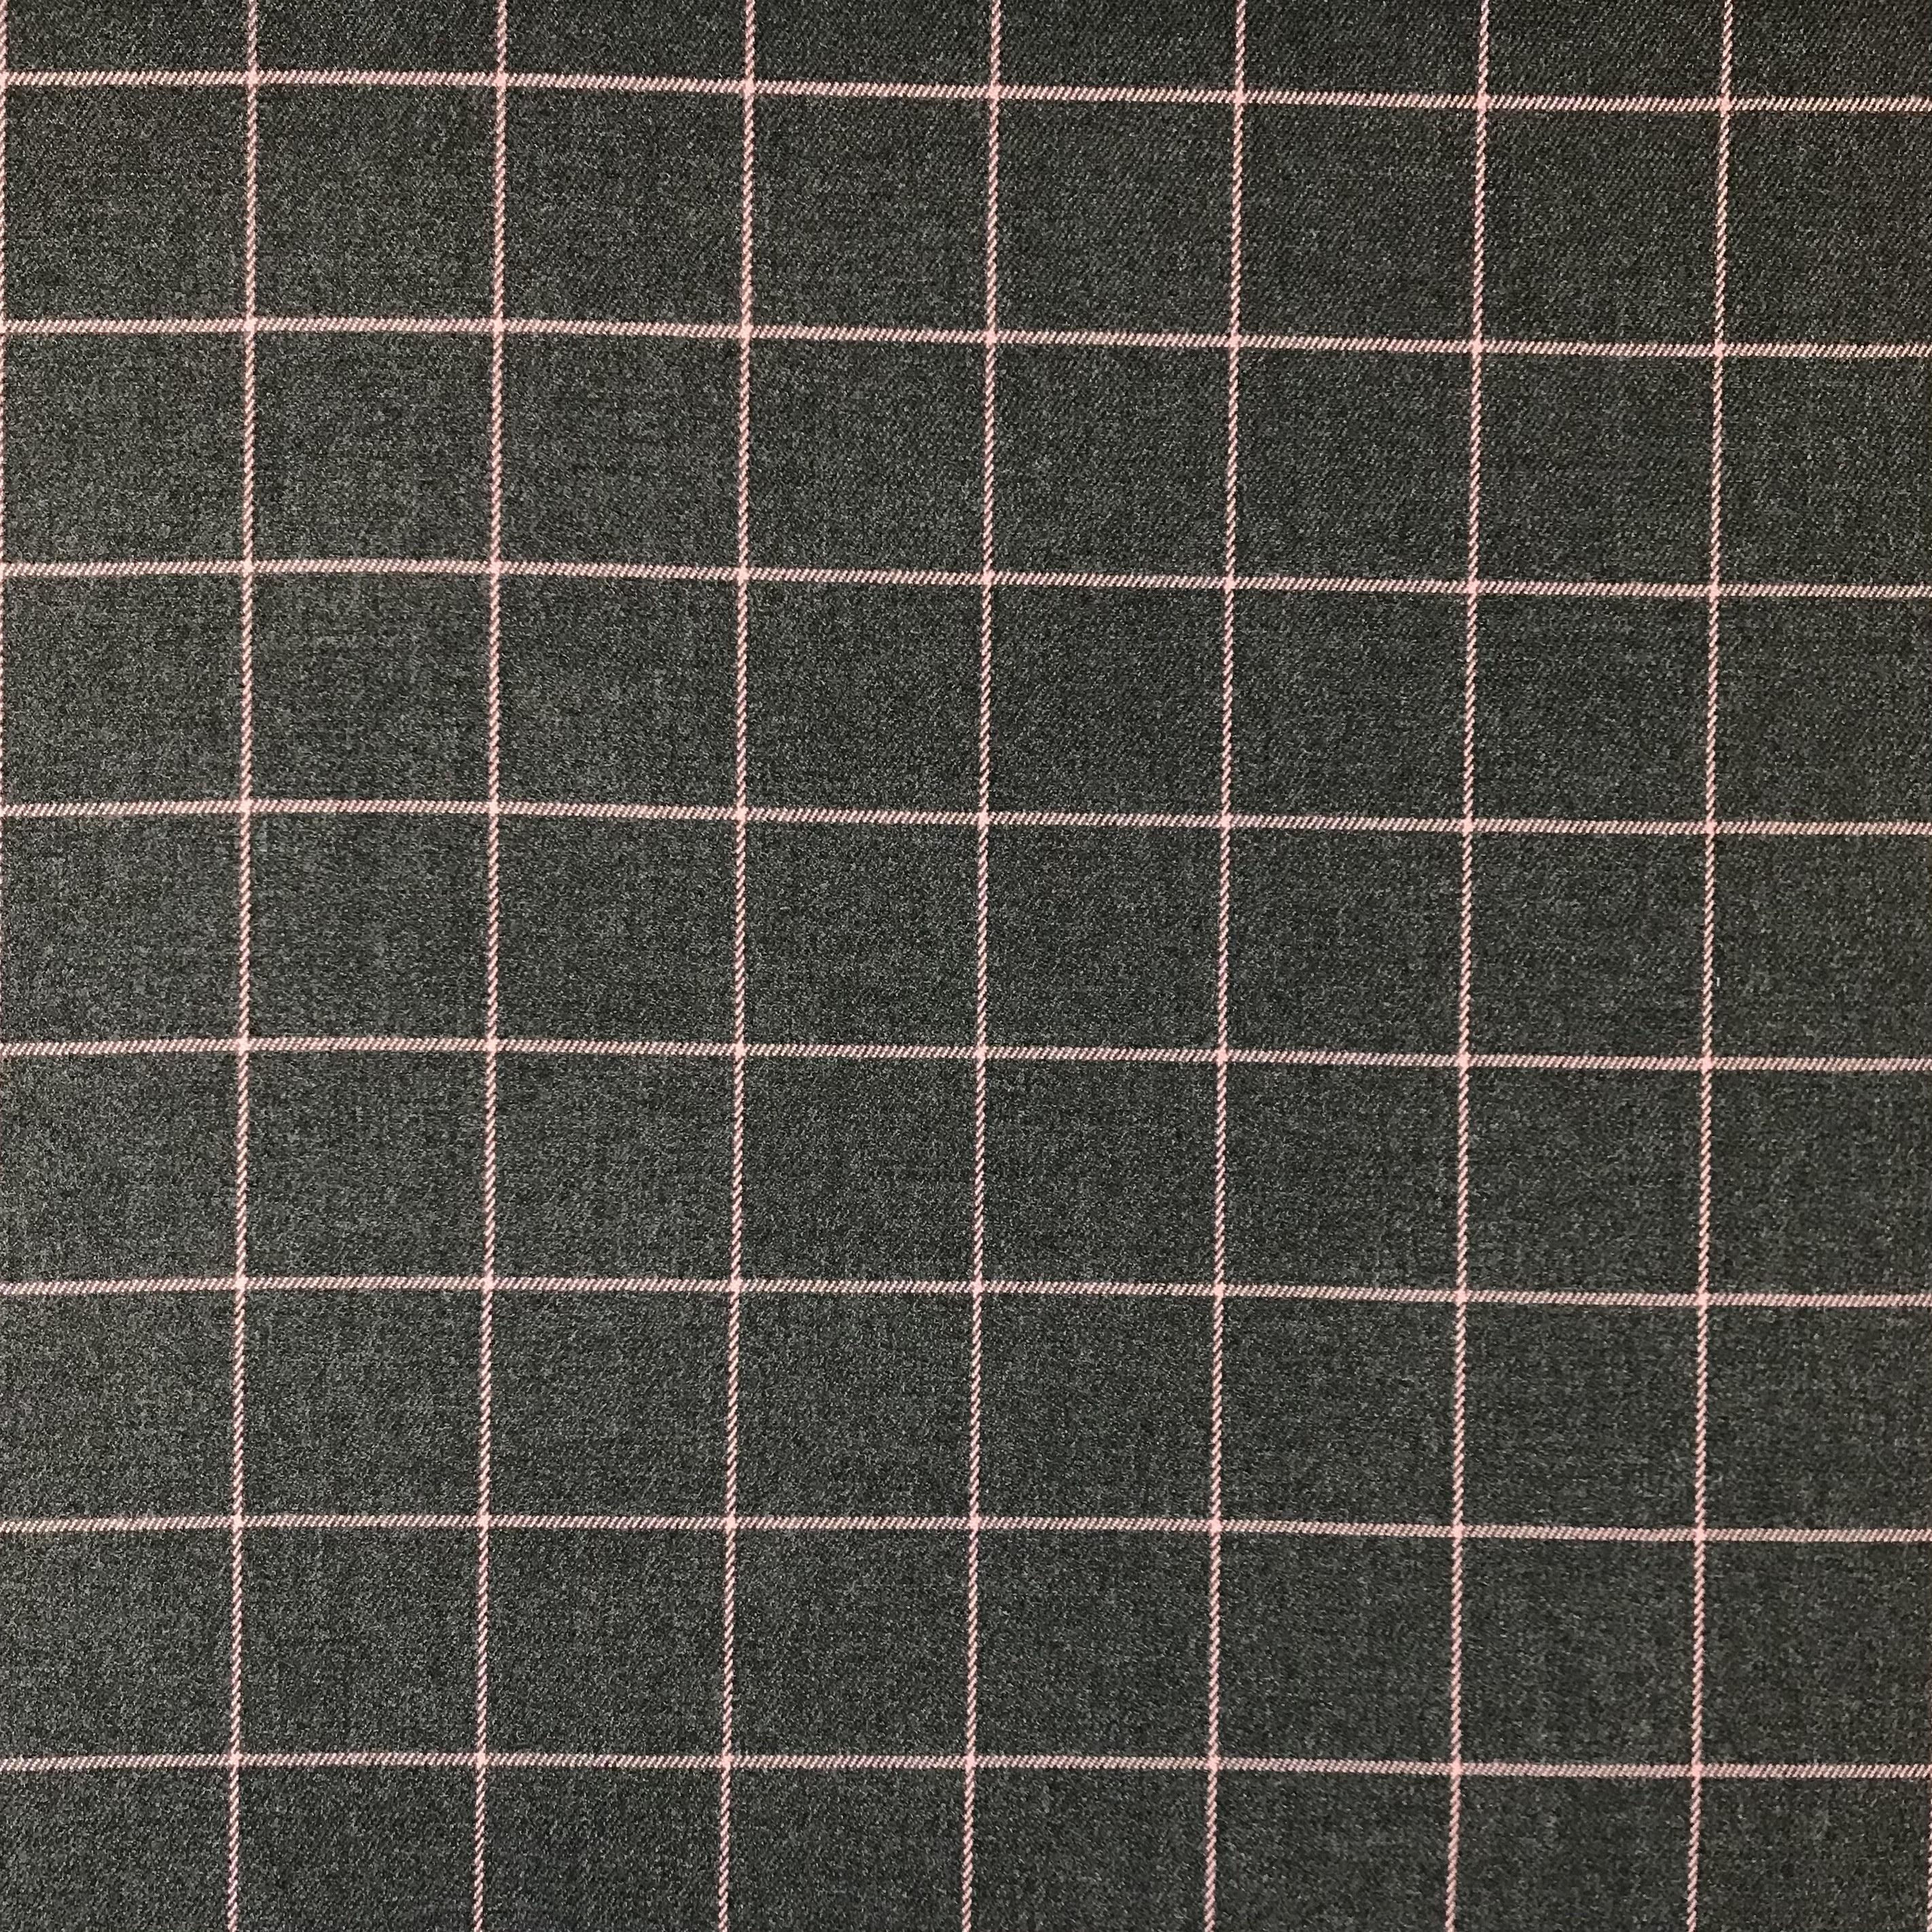 Hosen- & Anzugstoff Viskosenmix, Karos, dunkelgrau meliert/altrosa. Art. 05202.003